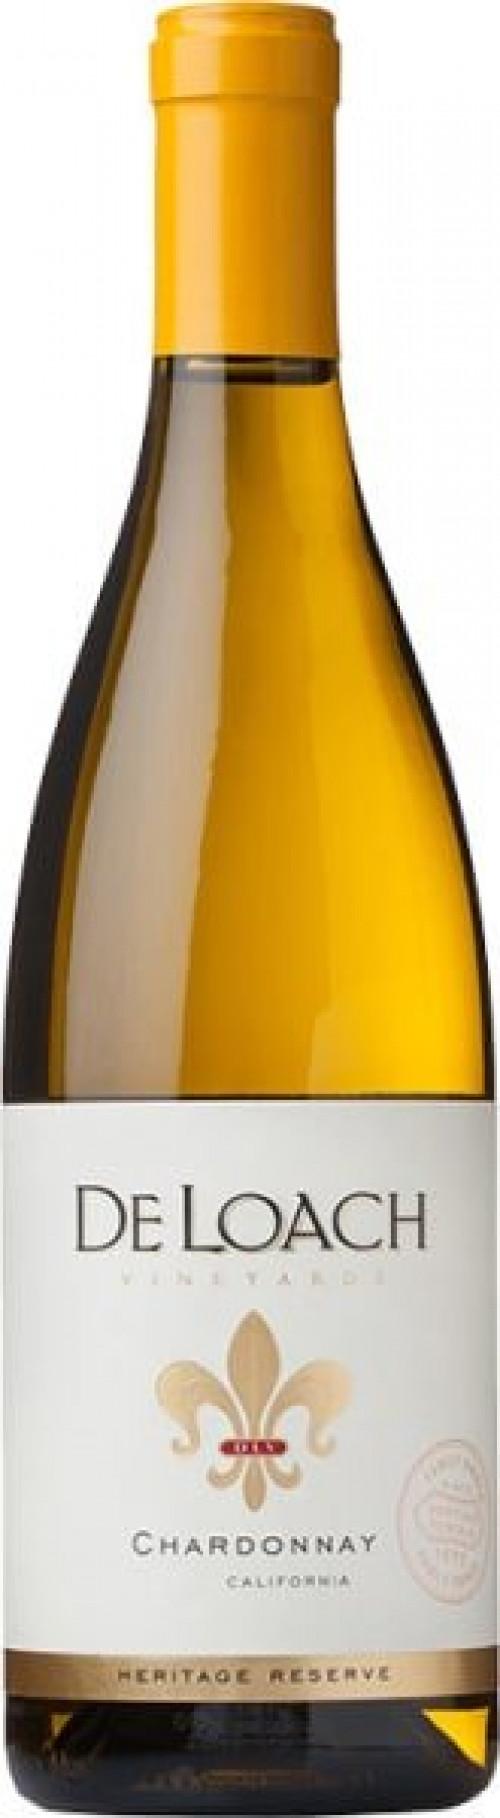 2018 DeLoach Heritage Chardonnay 750ml